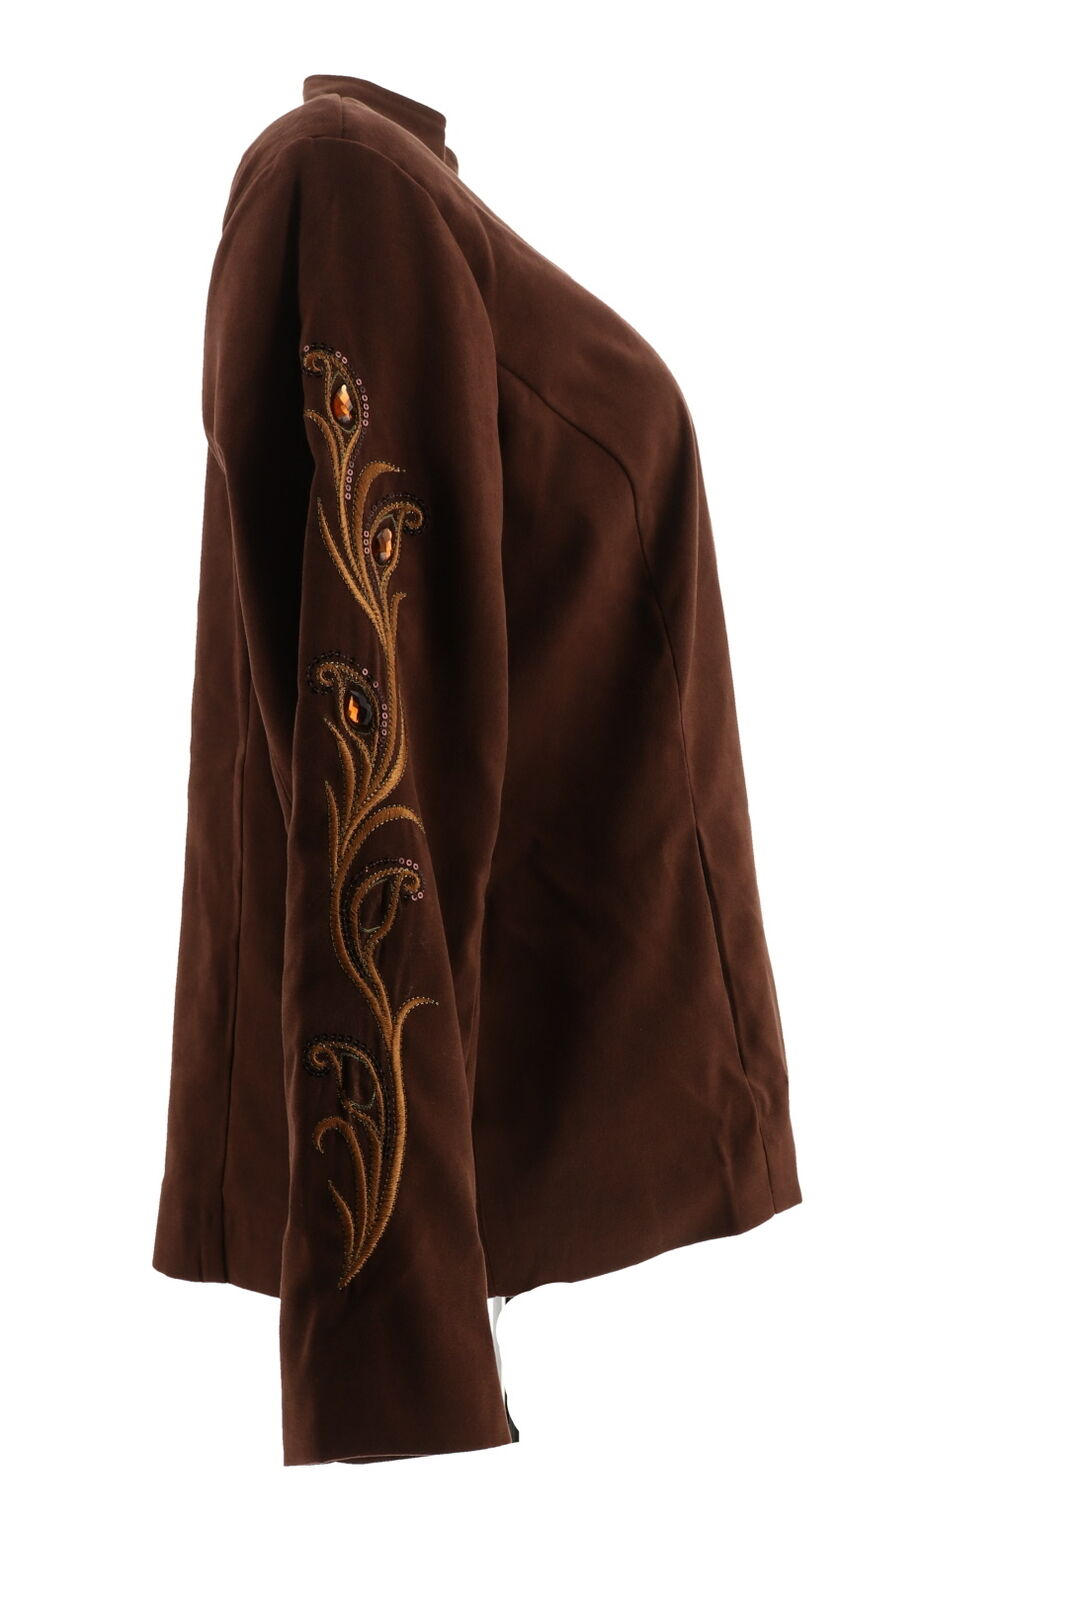 Bob Mackie Faux Suede Jacket Rhinestone Embroidery Black XL NEW A298765